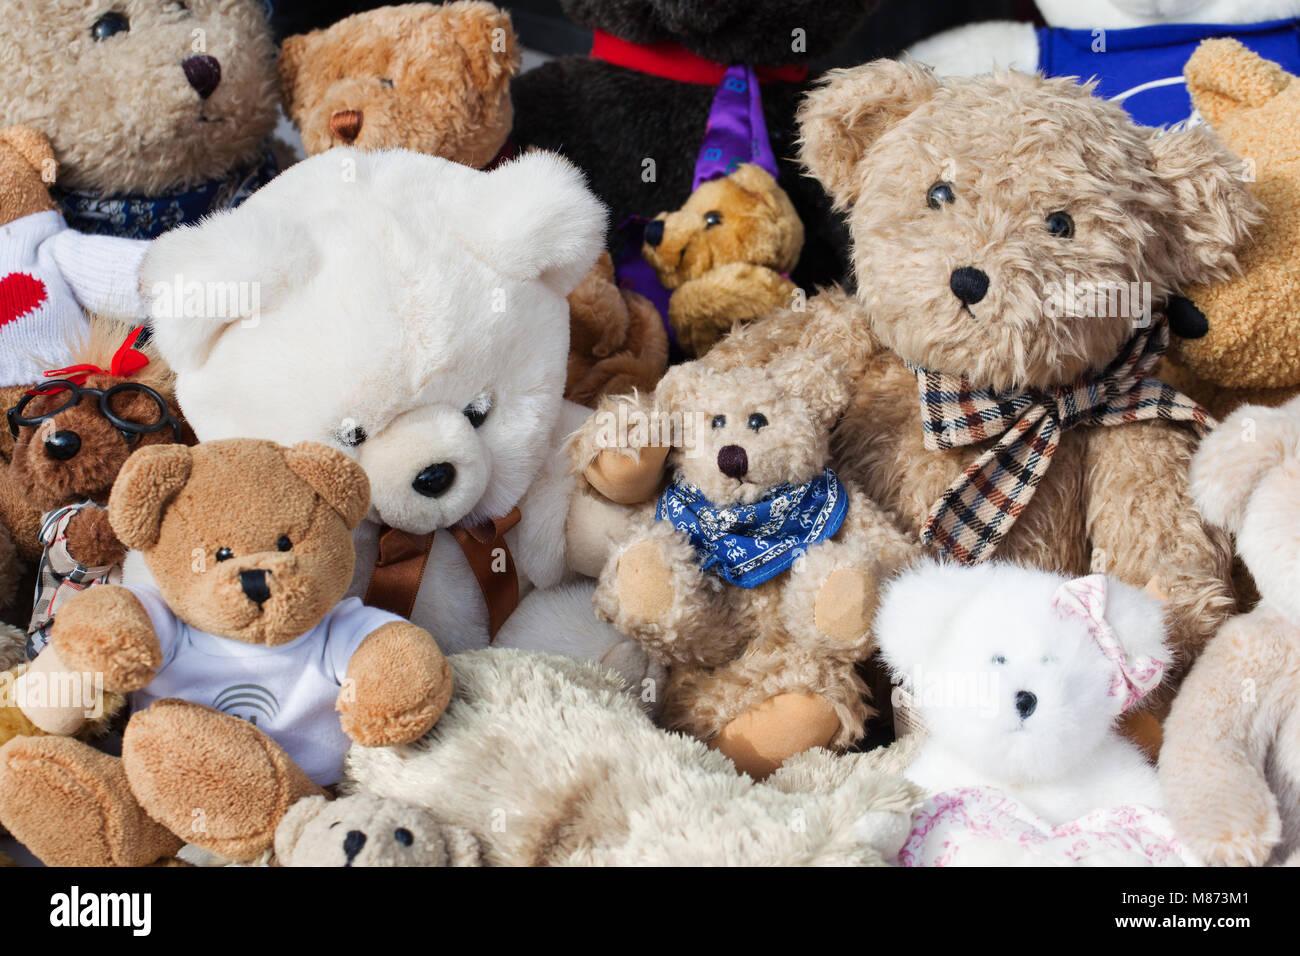 assortment of old teddies at flea market - Stock Image